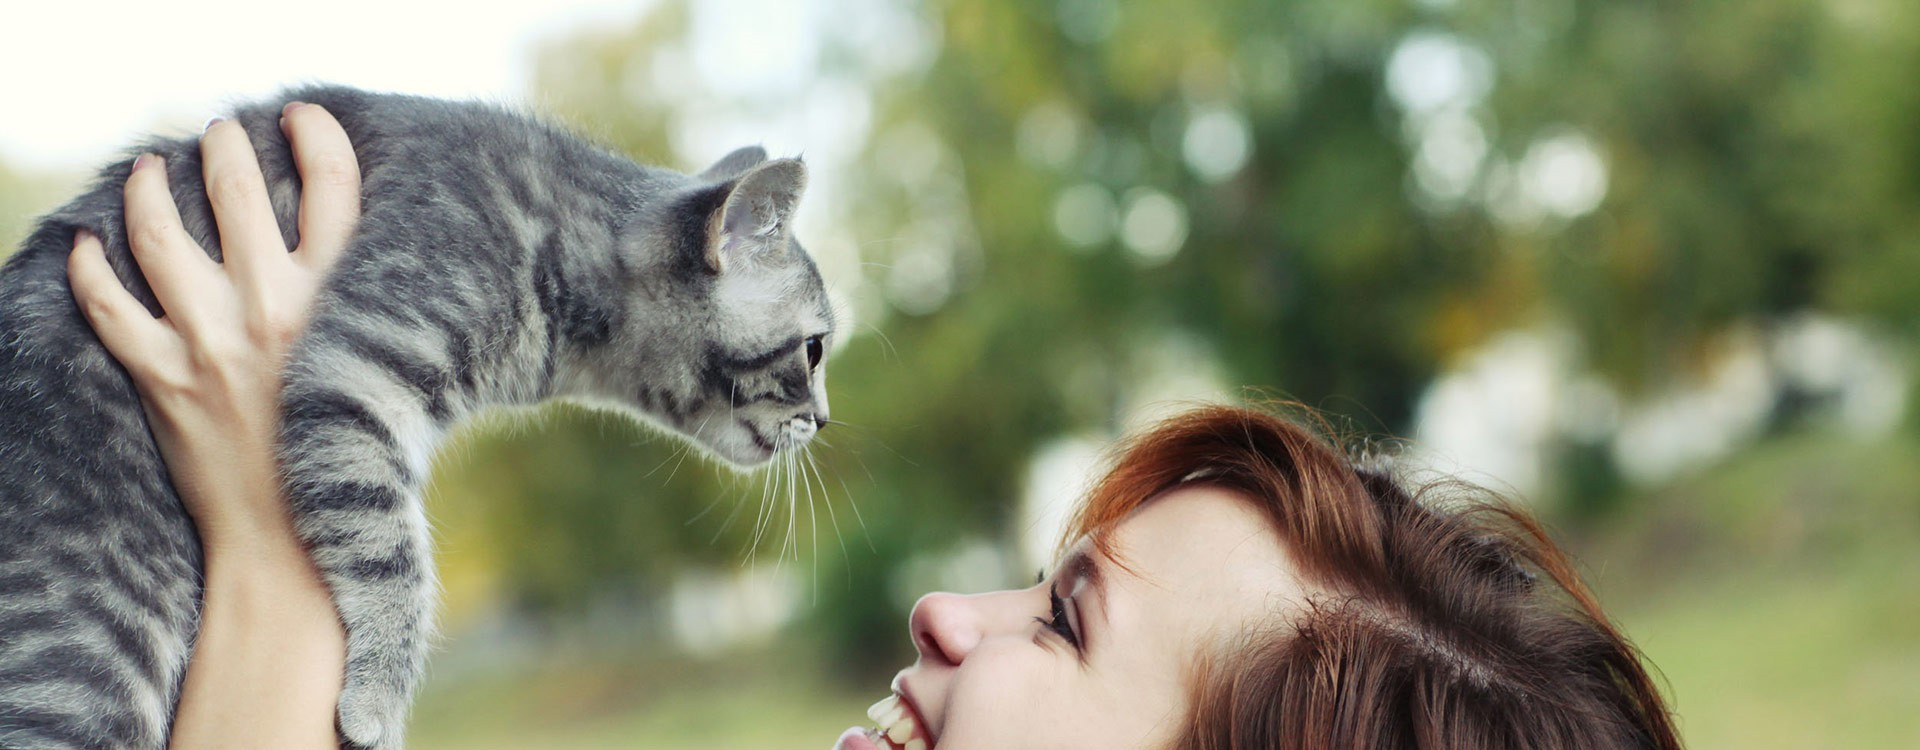 girl_with_cat_full